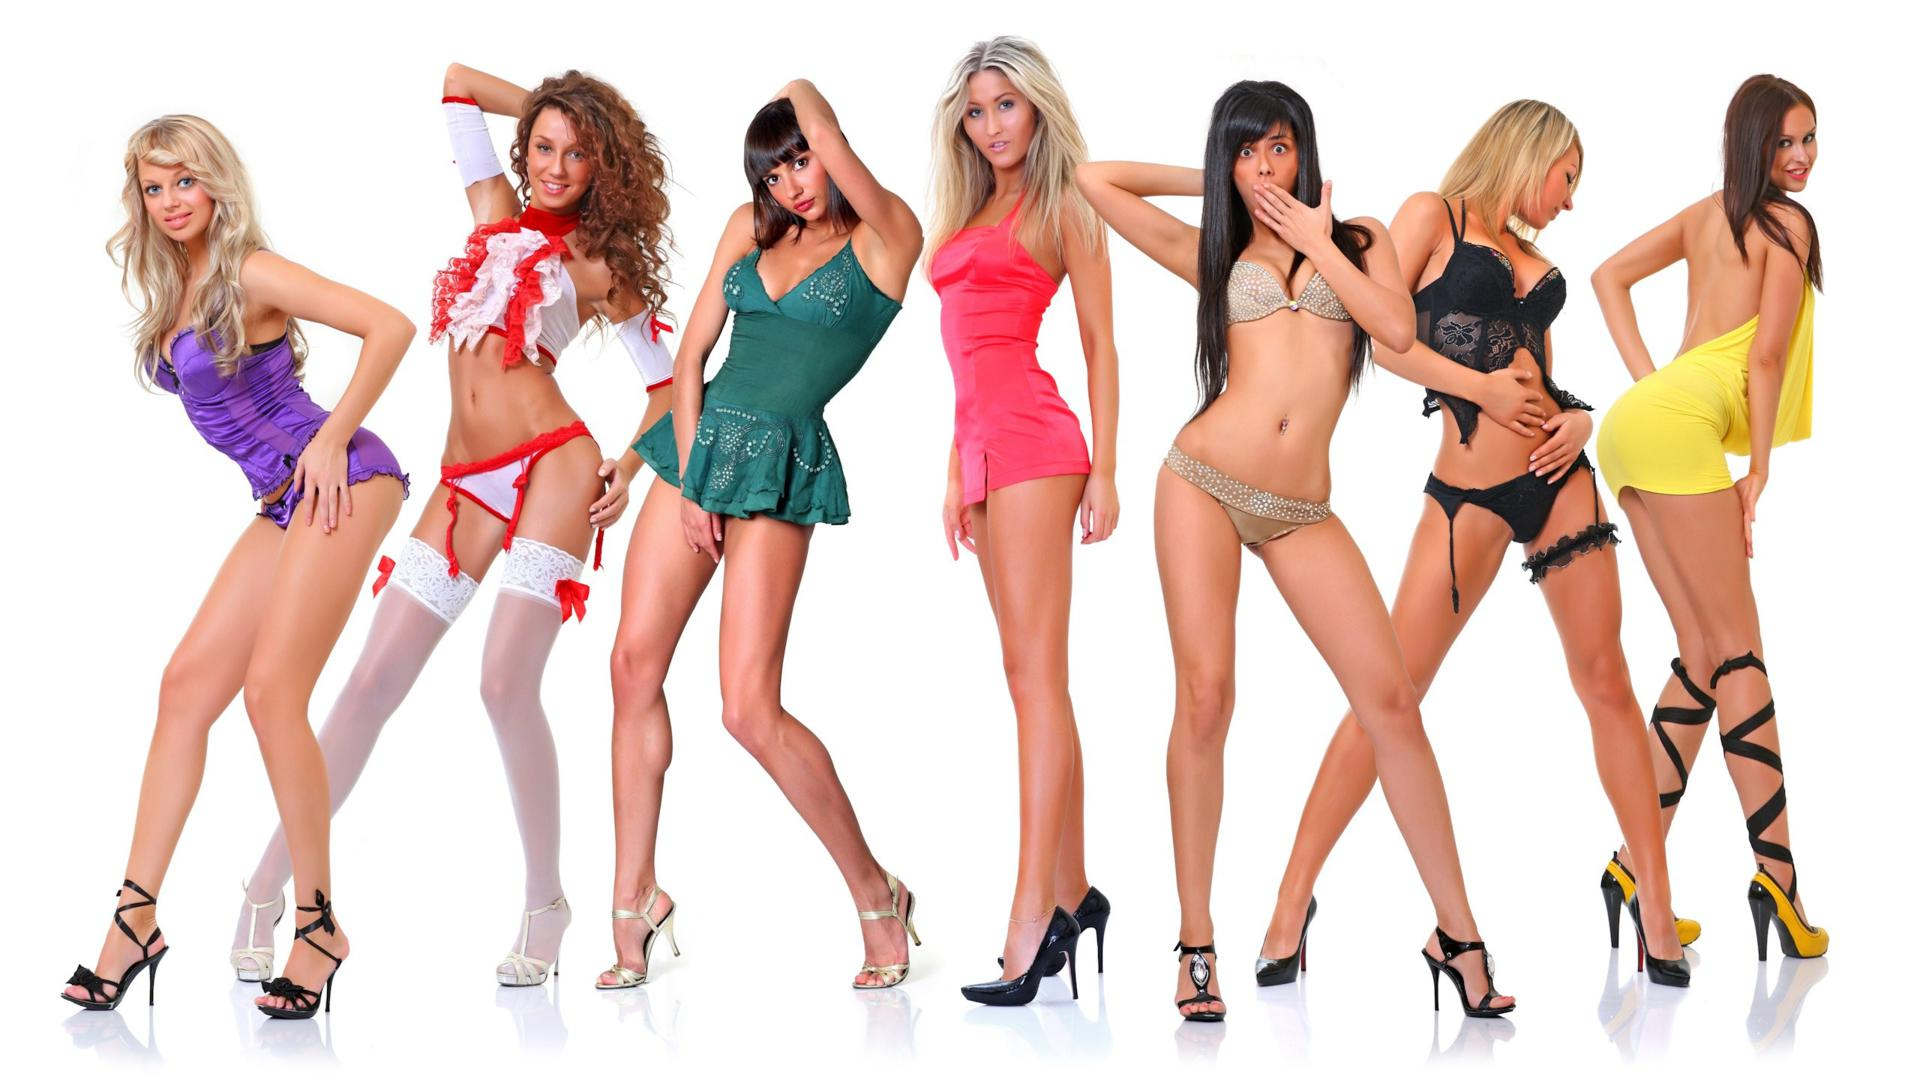 heels 7 babes posing sexy dressed lingerie hot legs high heels